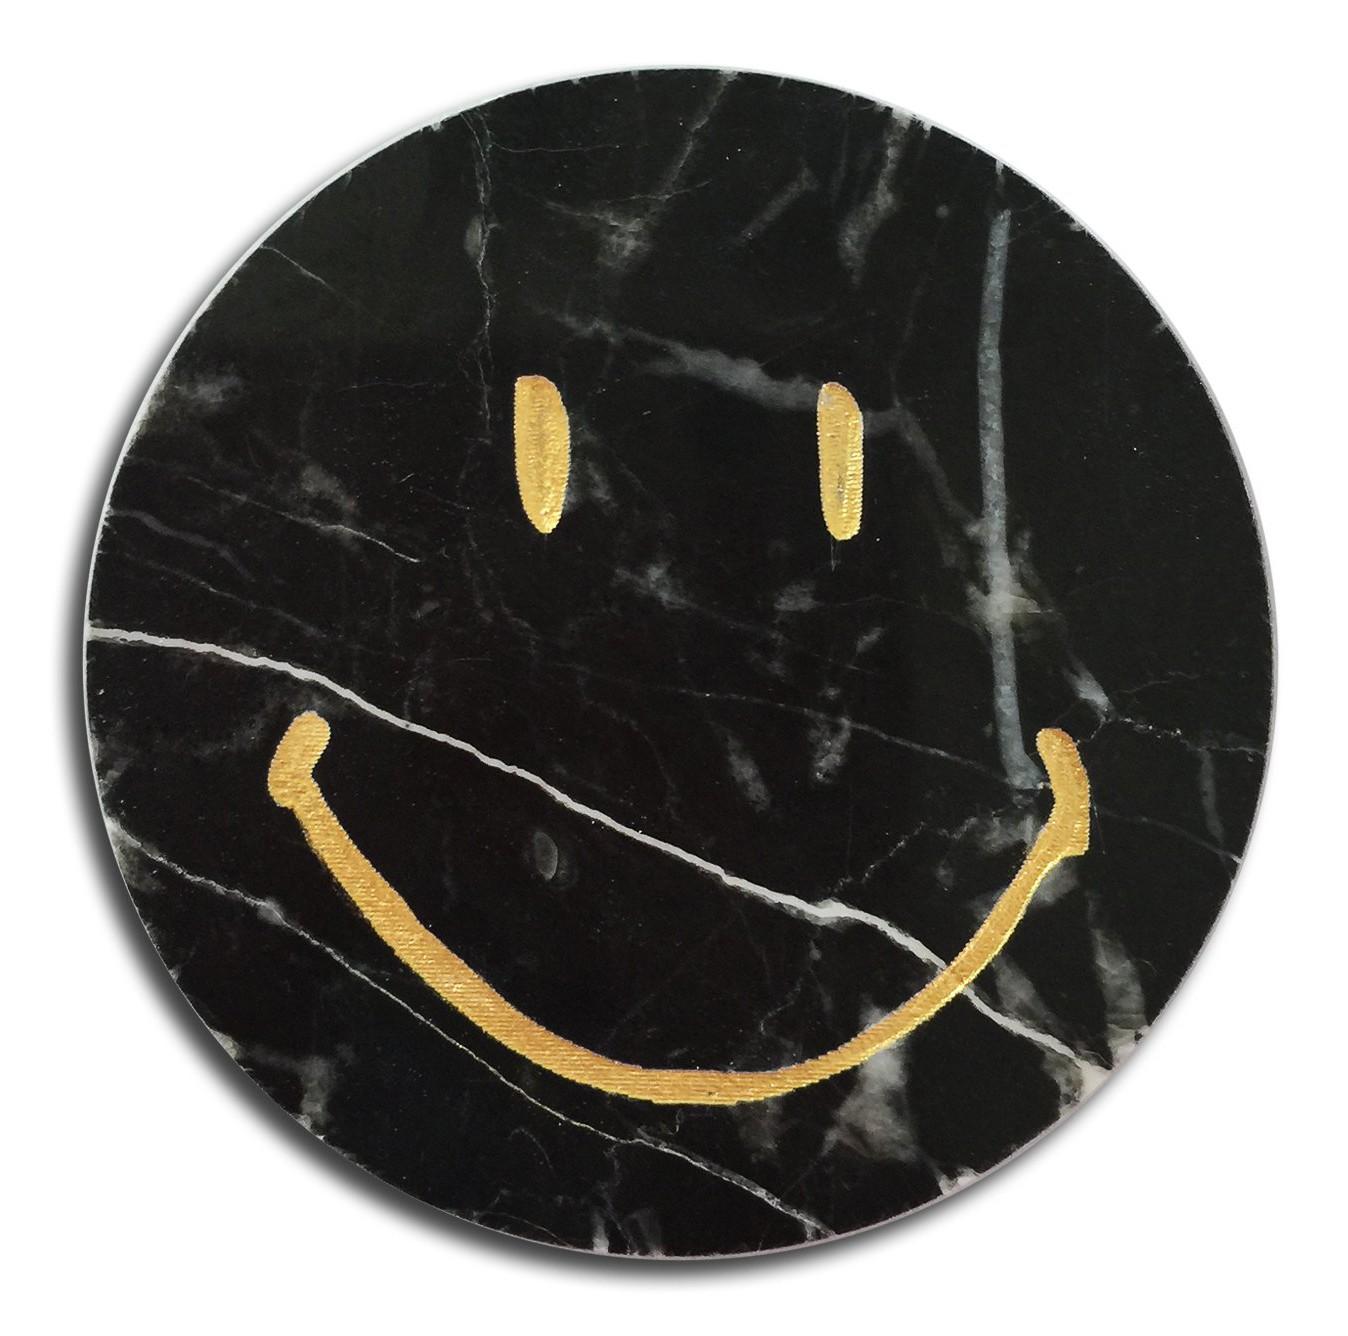 Mikol Marmi Marquina Black Marble Smile Sticker Real Marble Desk Supplies Mikol Marmi Collection Avvenice